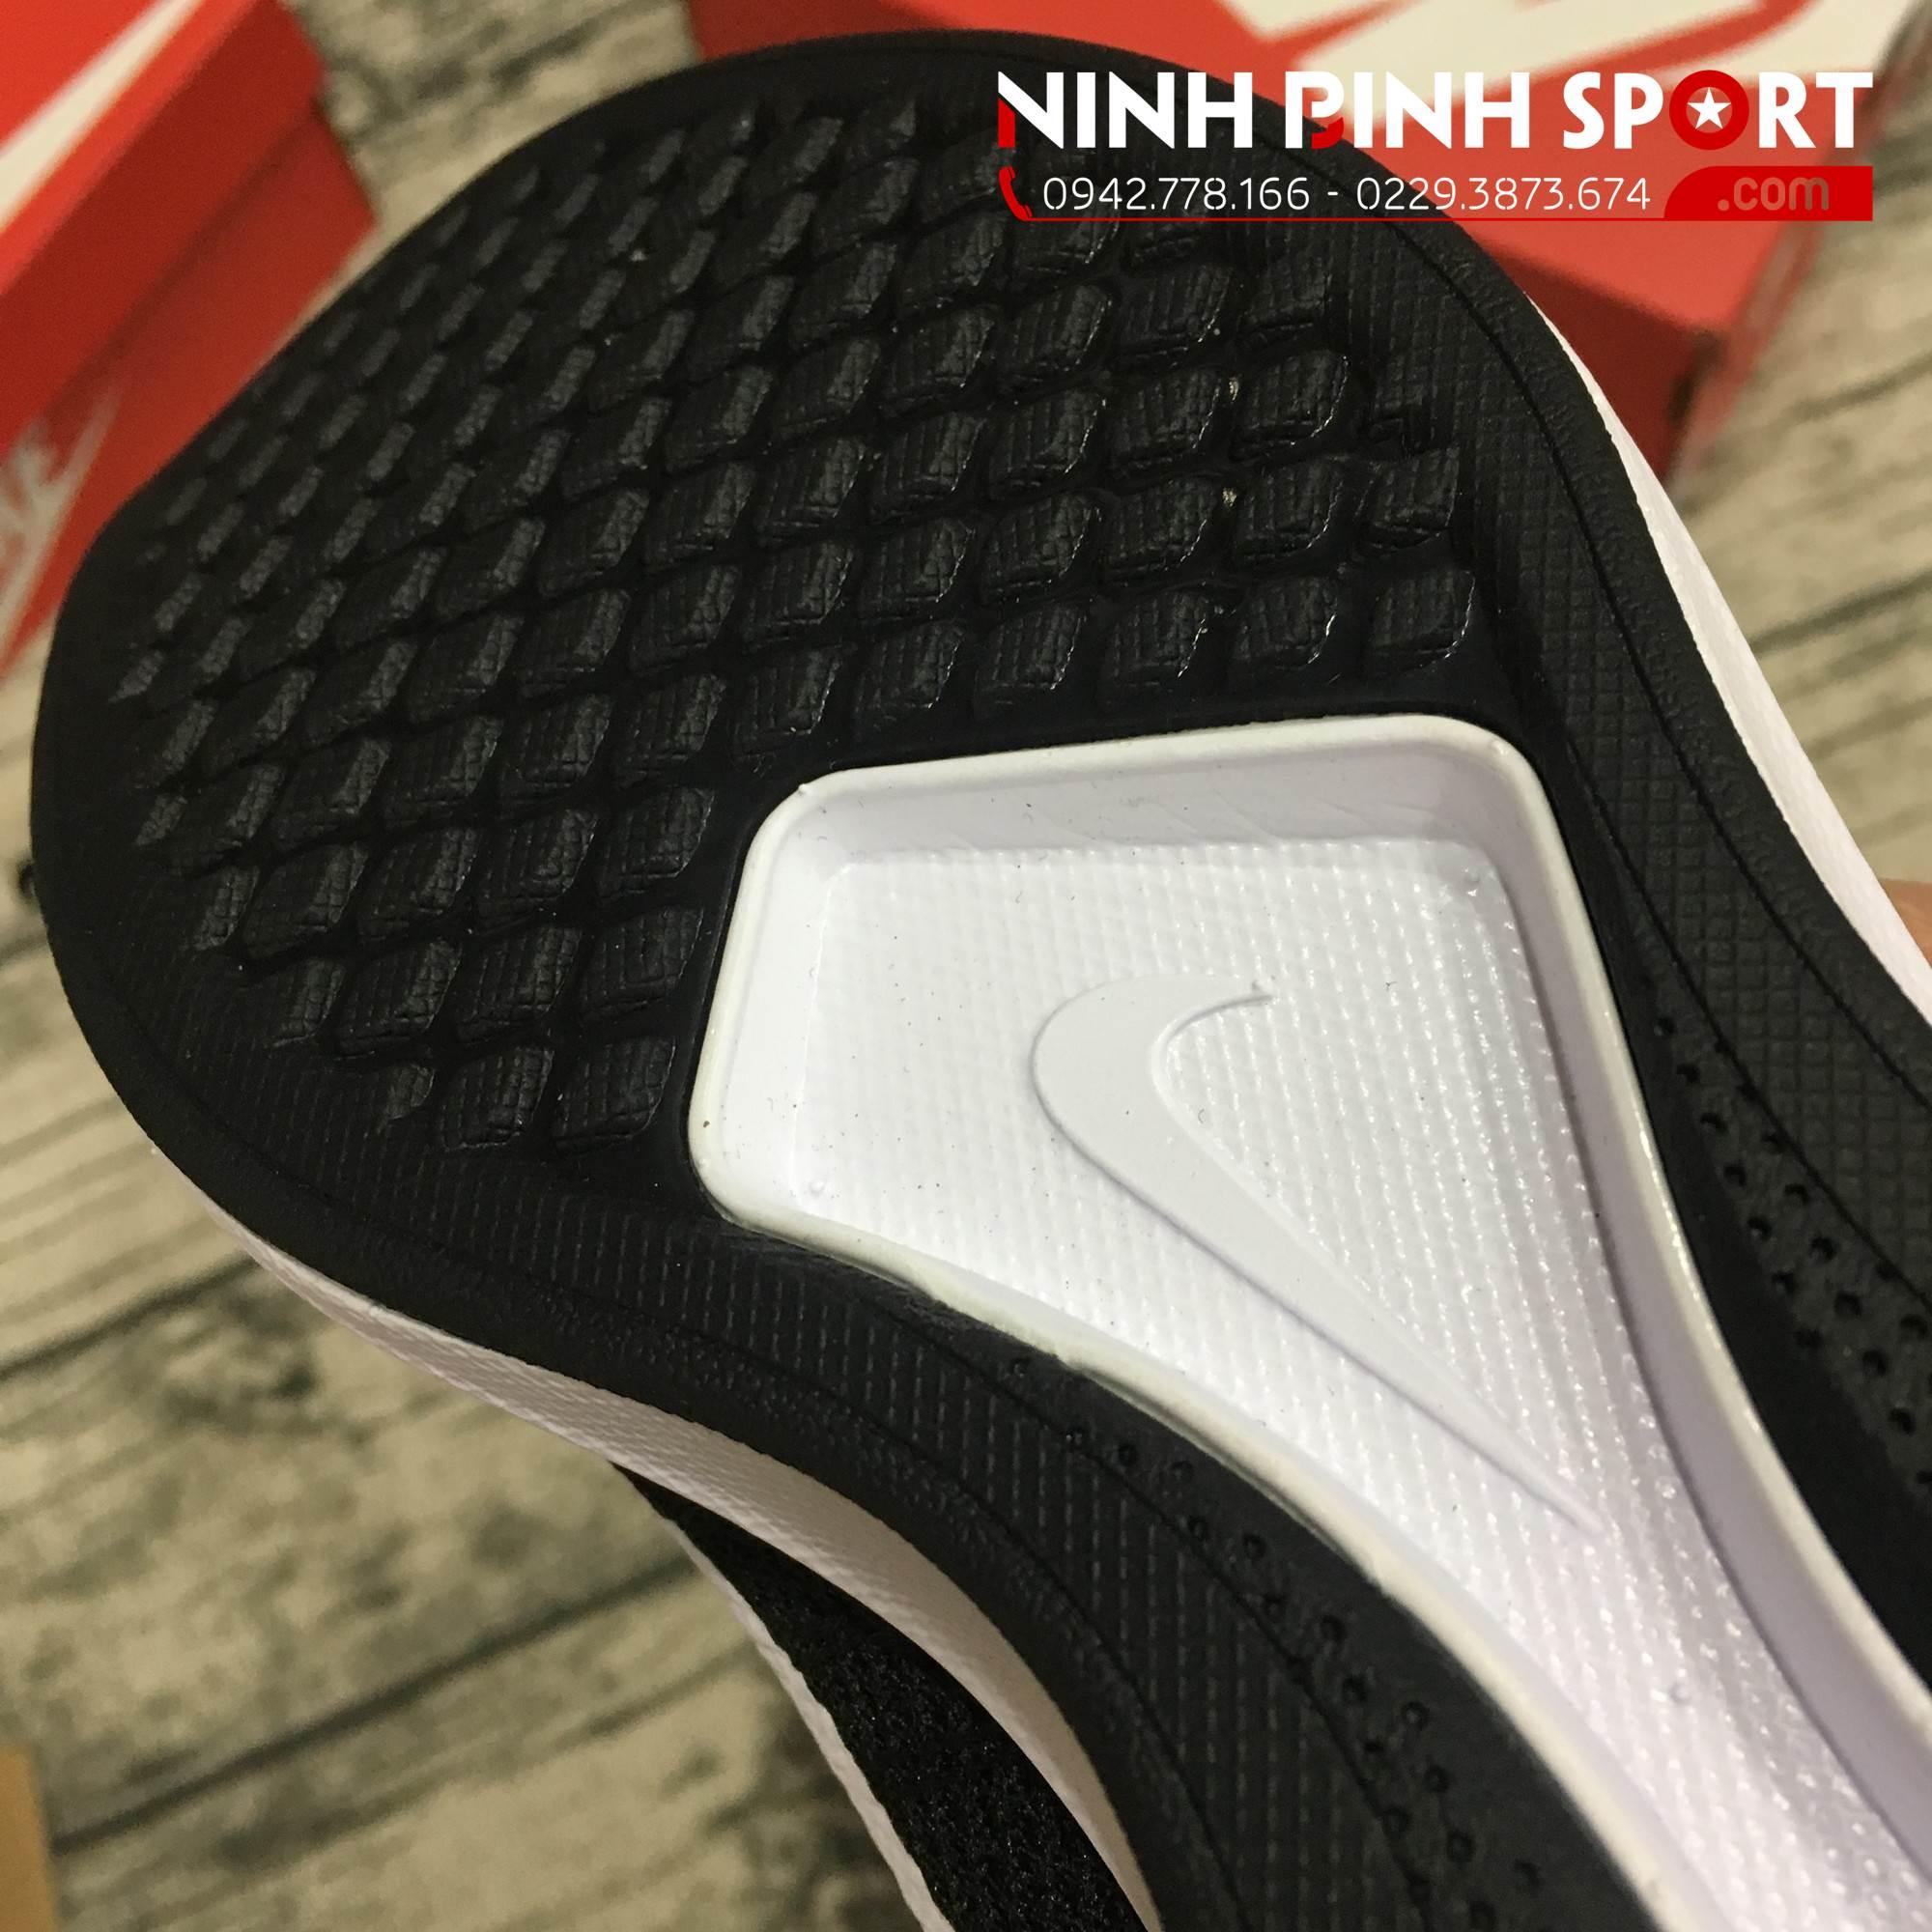 Giày thể thao nam Nike Dualtone Racer Black 918227-002